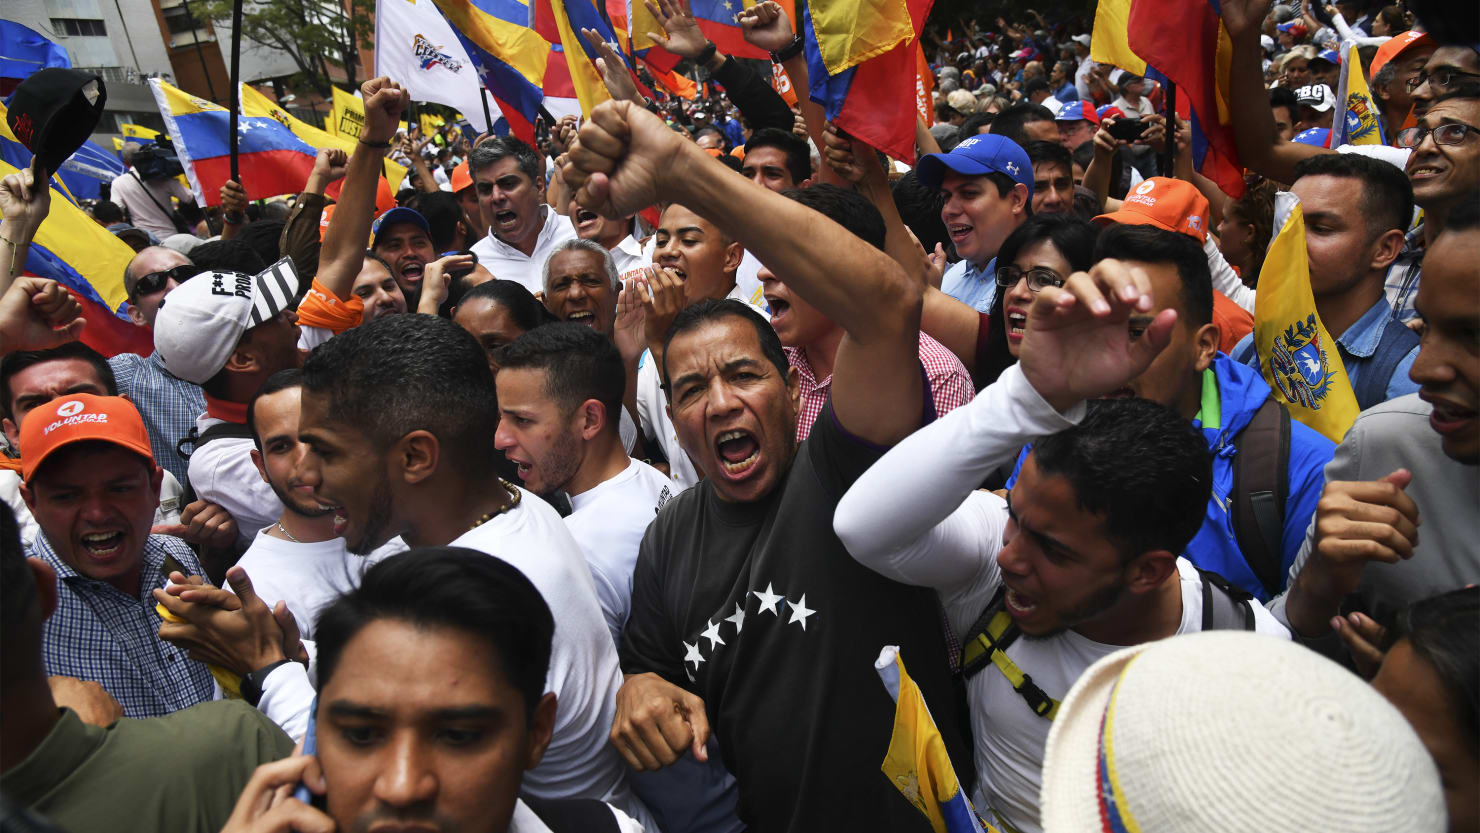 Capturing Venezuela's Descent Into Socialist Hell